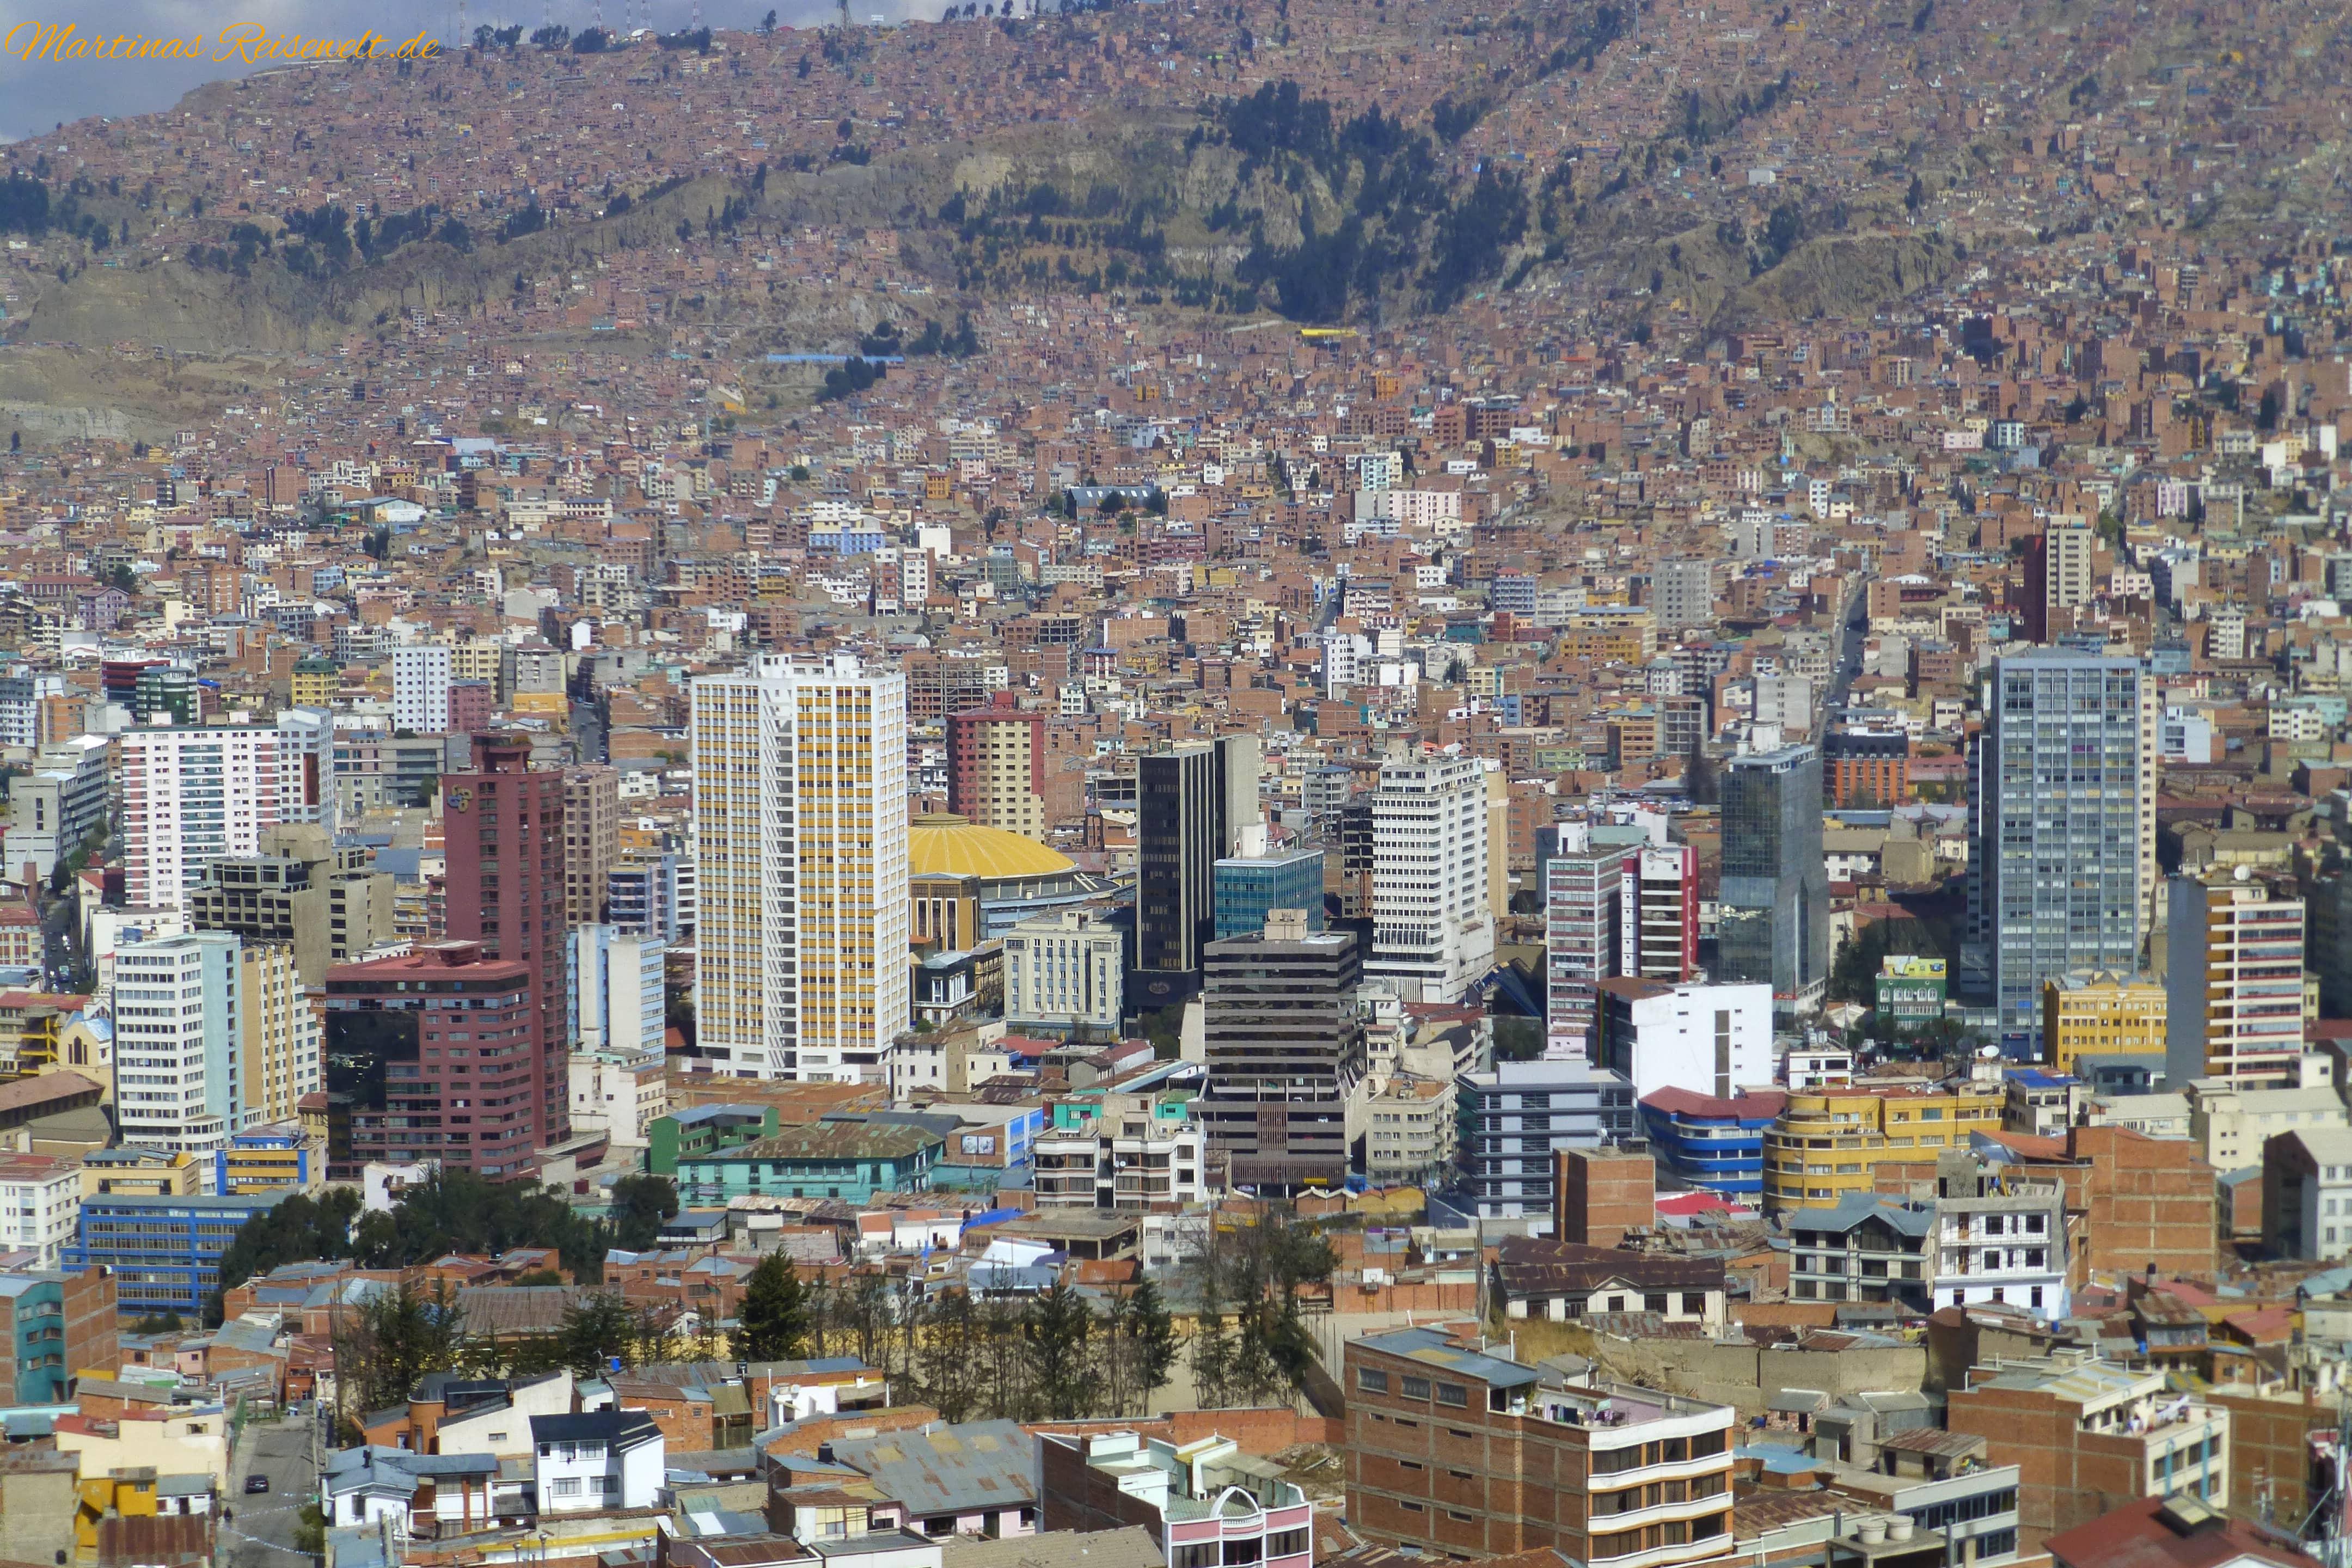 Mirador Killi Killi in La Paz